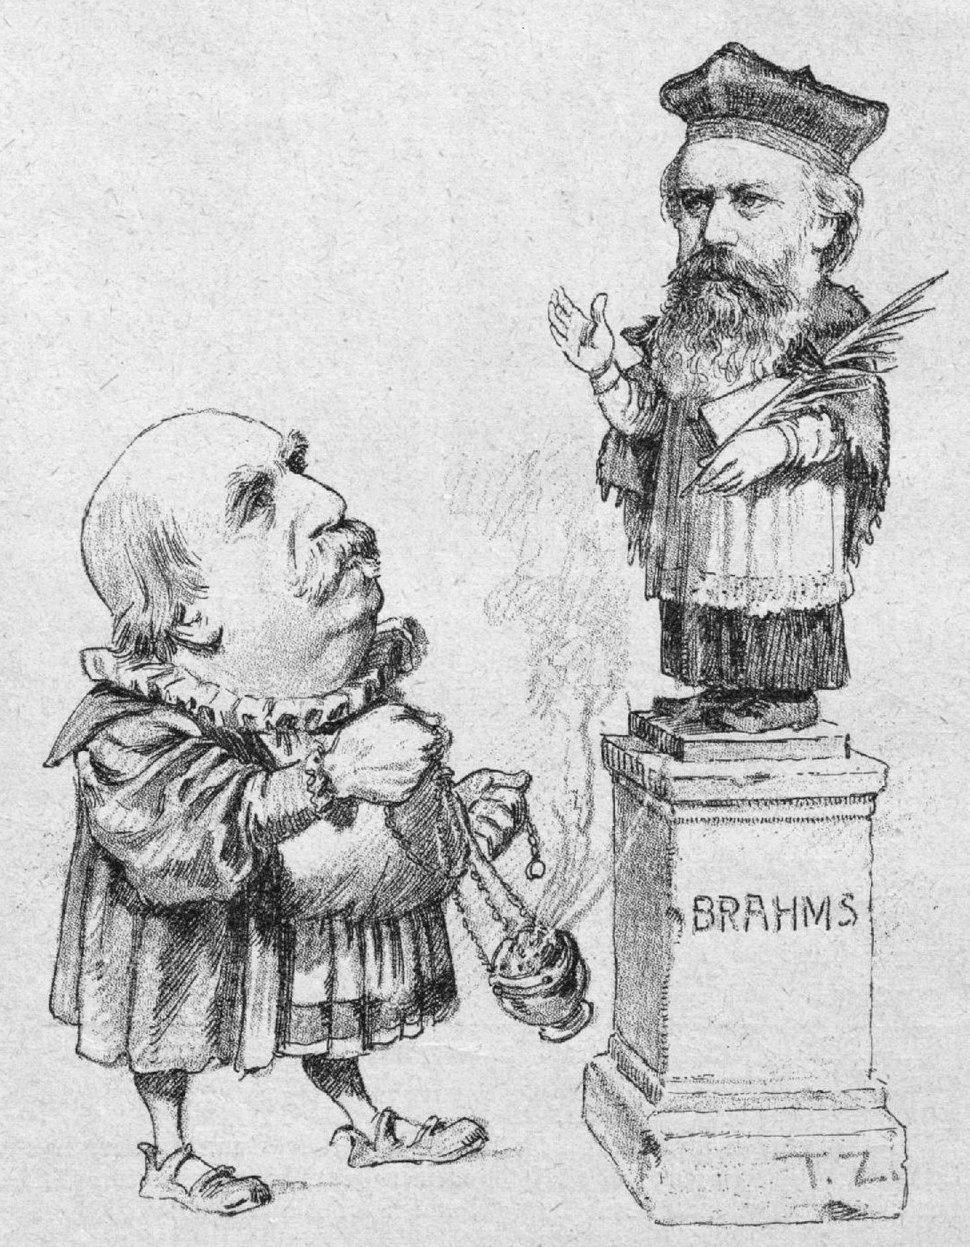 Eduard Hanslick offering incense to Brahms; cartoon rom the Viennese journal 'Figaro', 1890